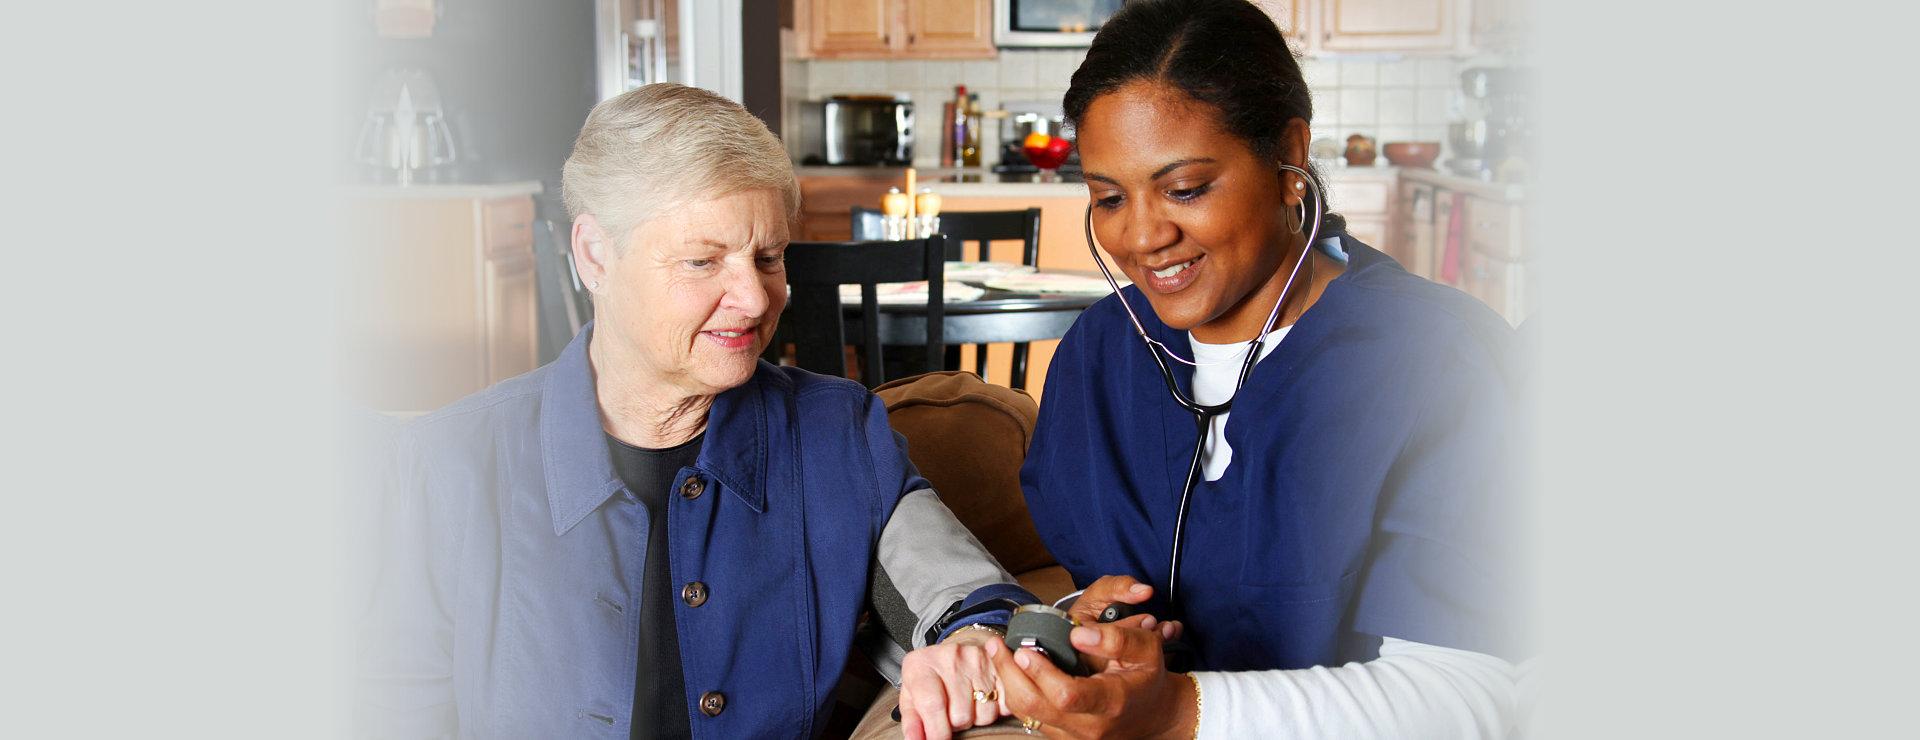 nurse checking blood pressure of her patient